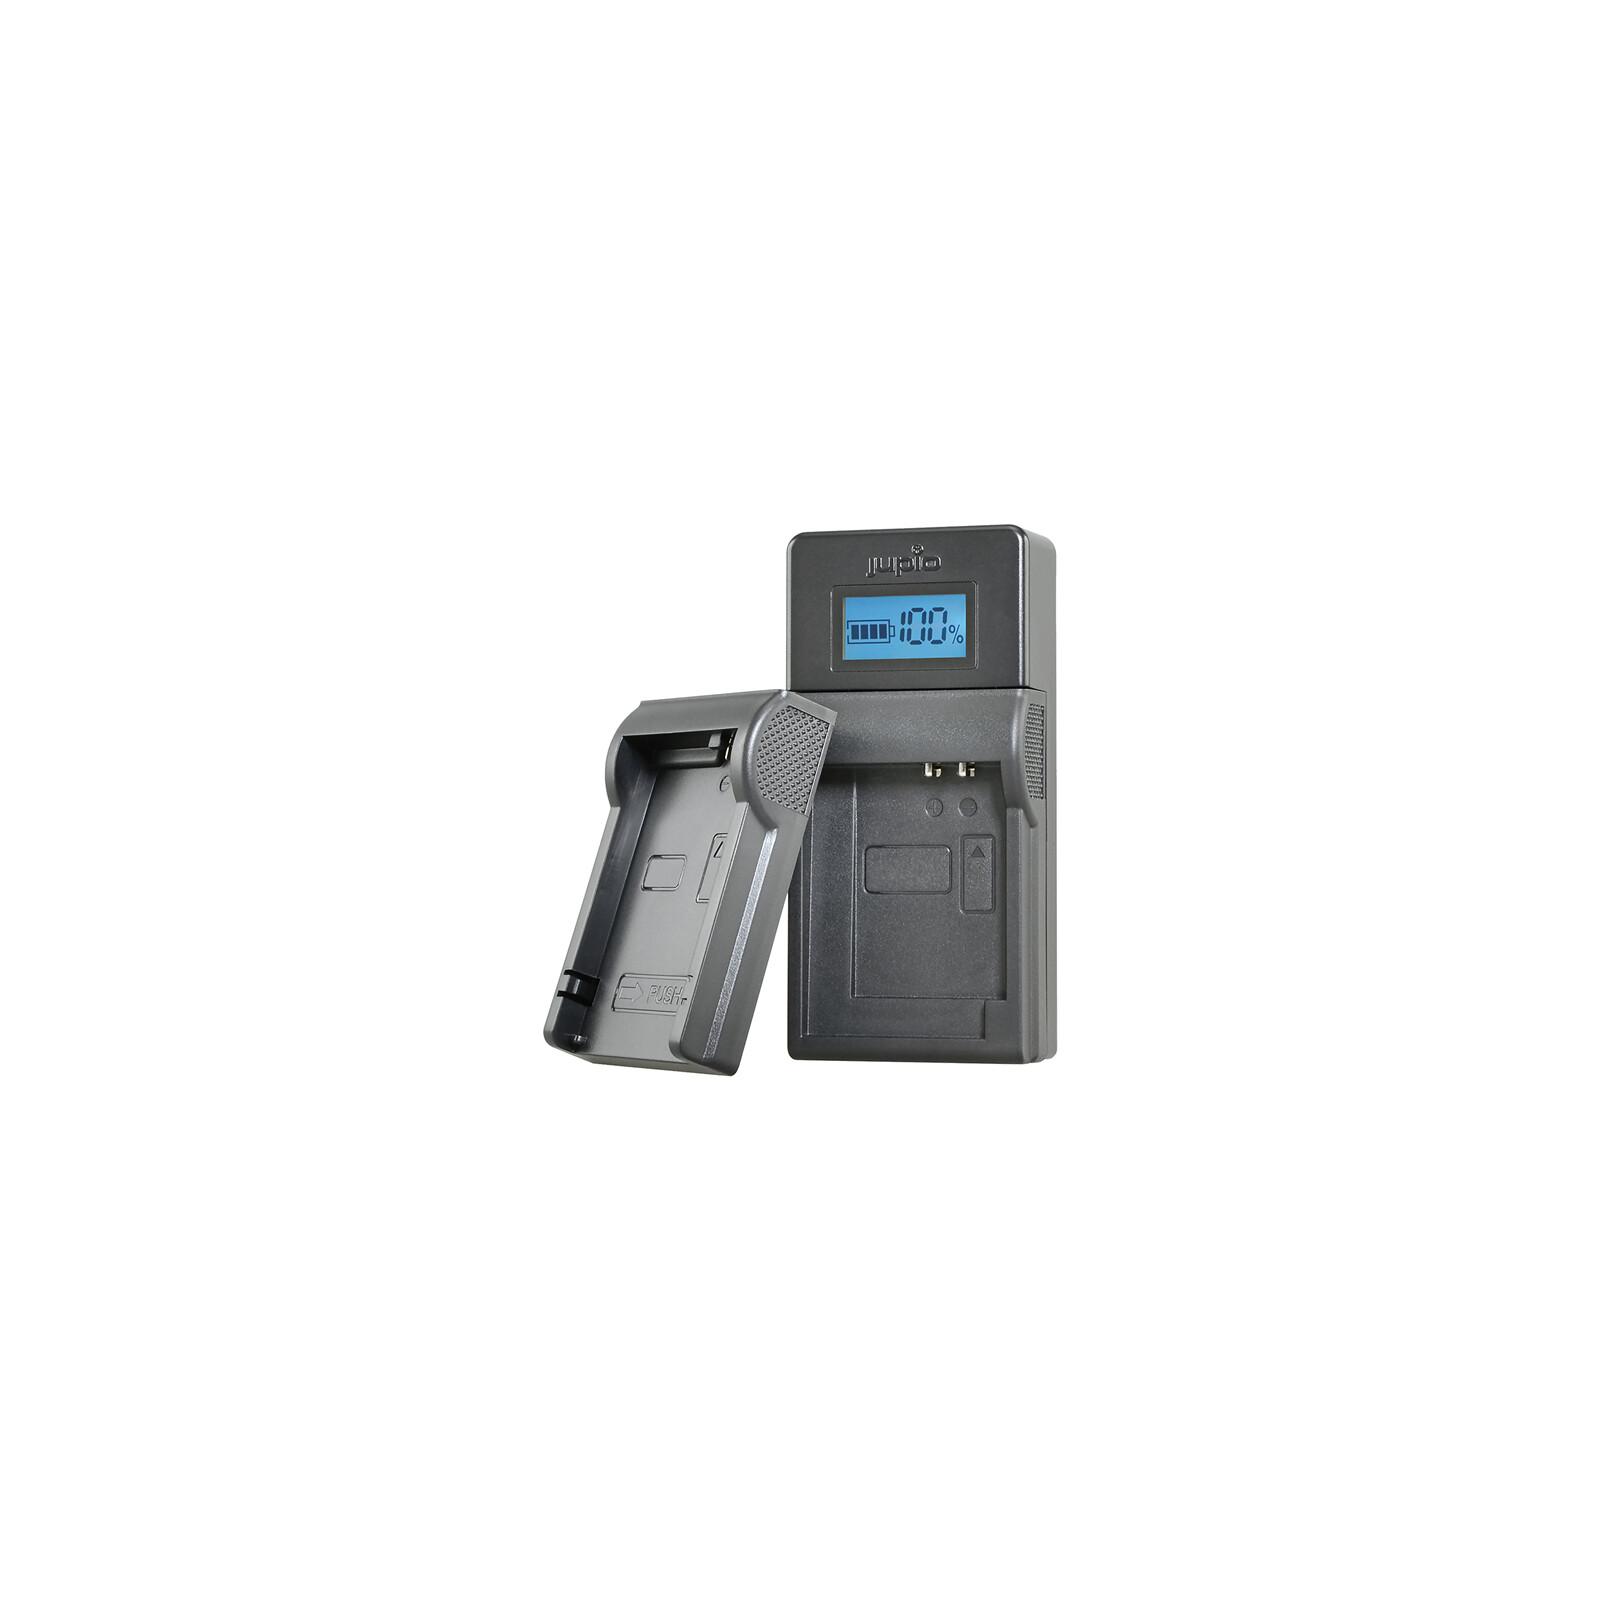 Jupio Brand Charger for Nikon, Fuji, Olympus 3.6-4.2V